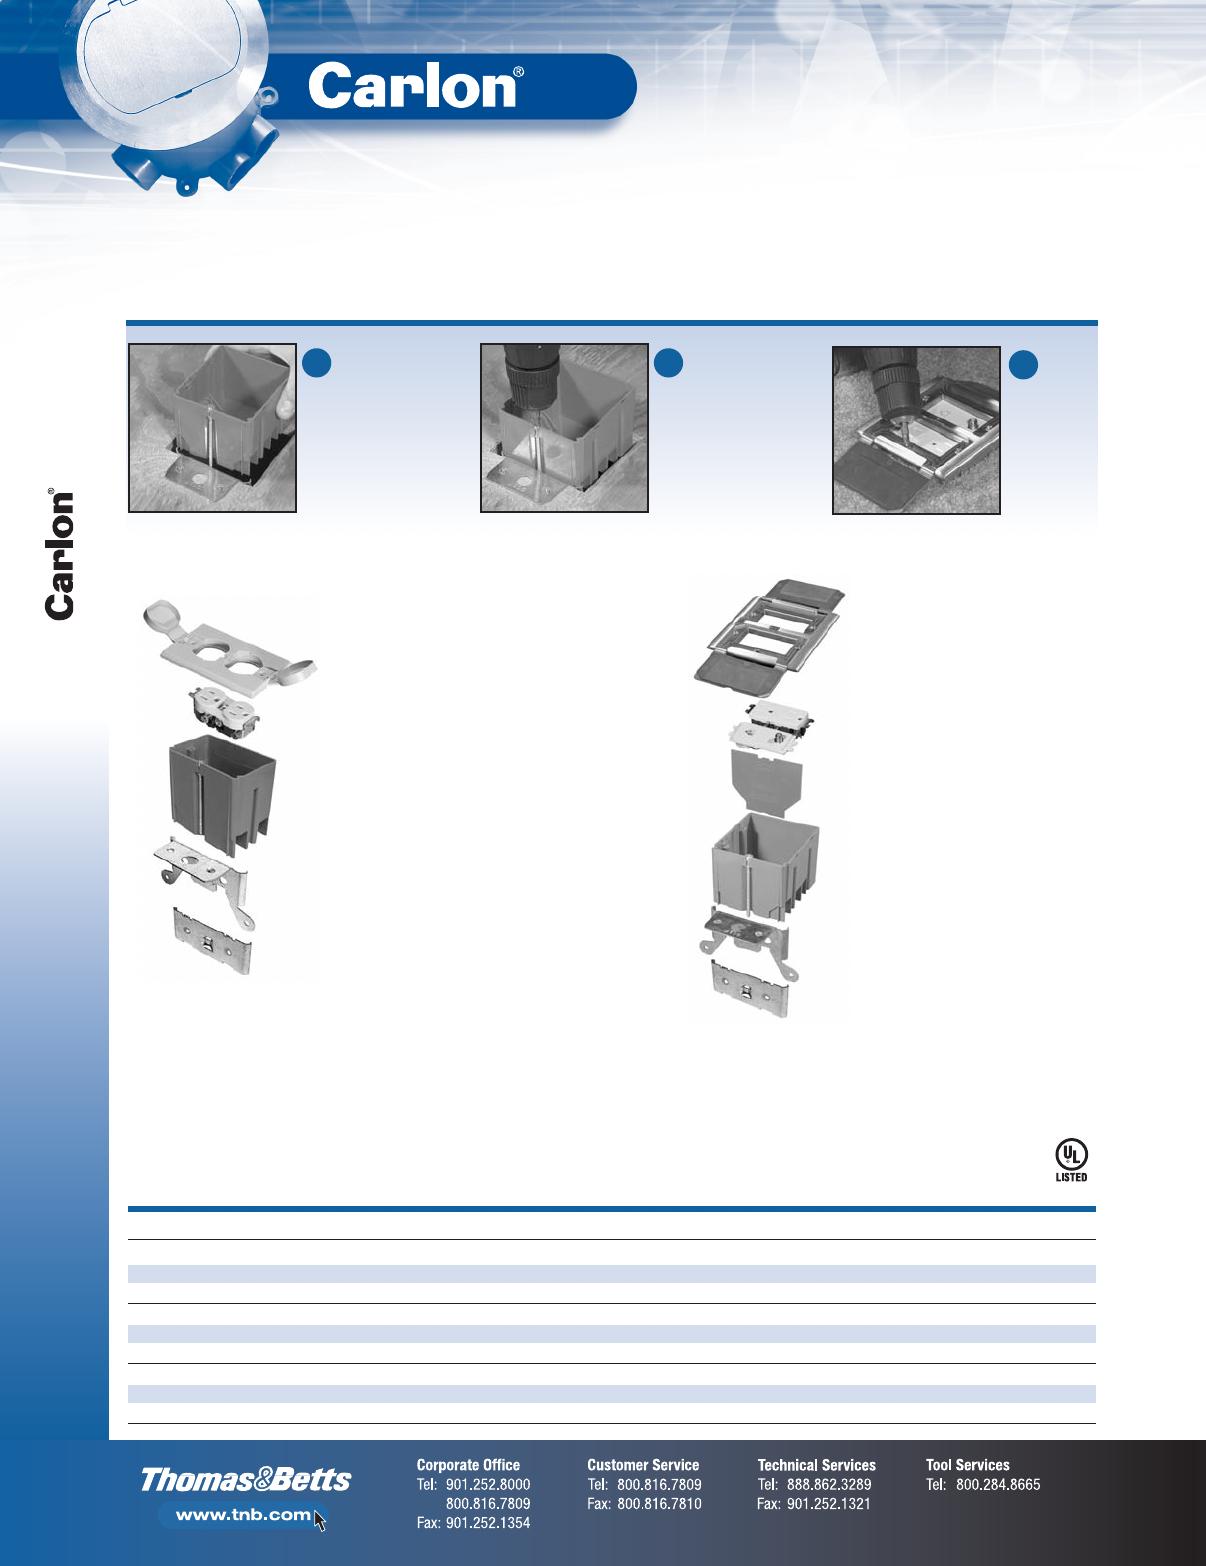 Carlon B121BFRW Adjustable Floor Box Kit With White Cover